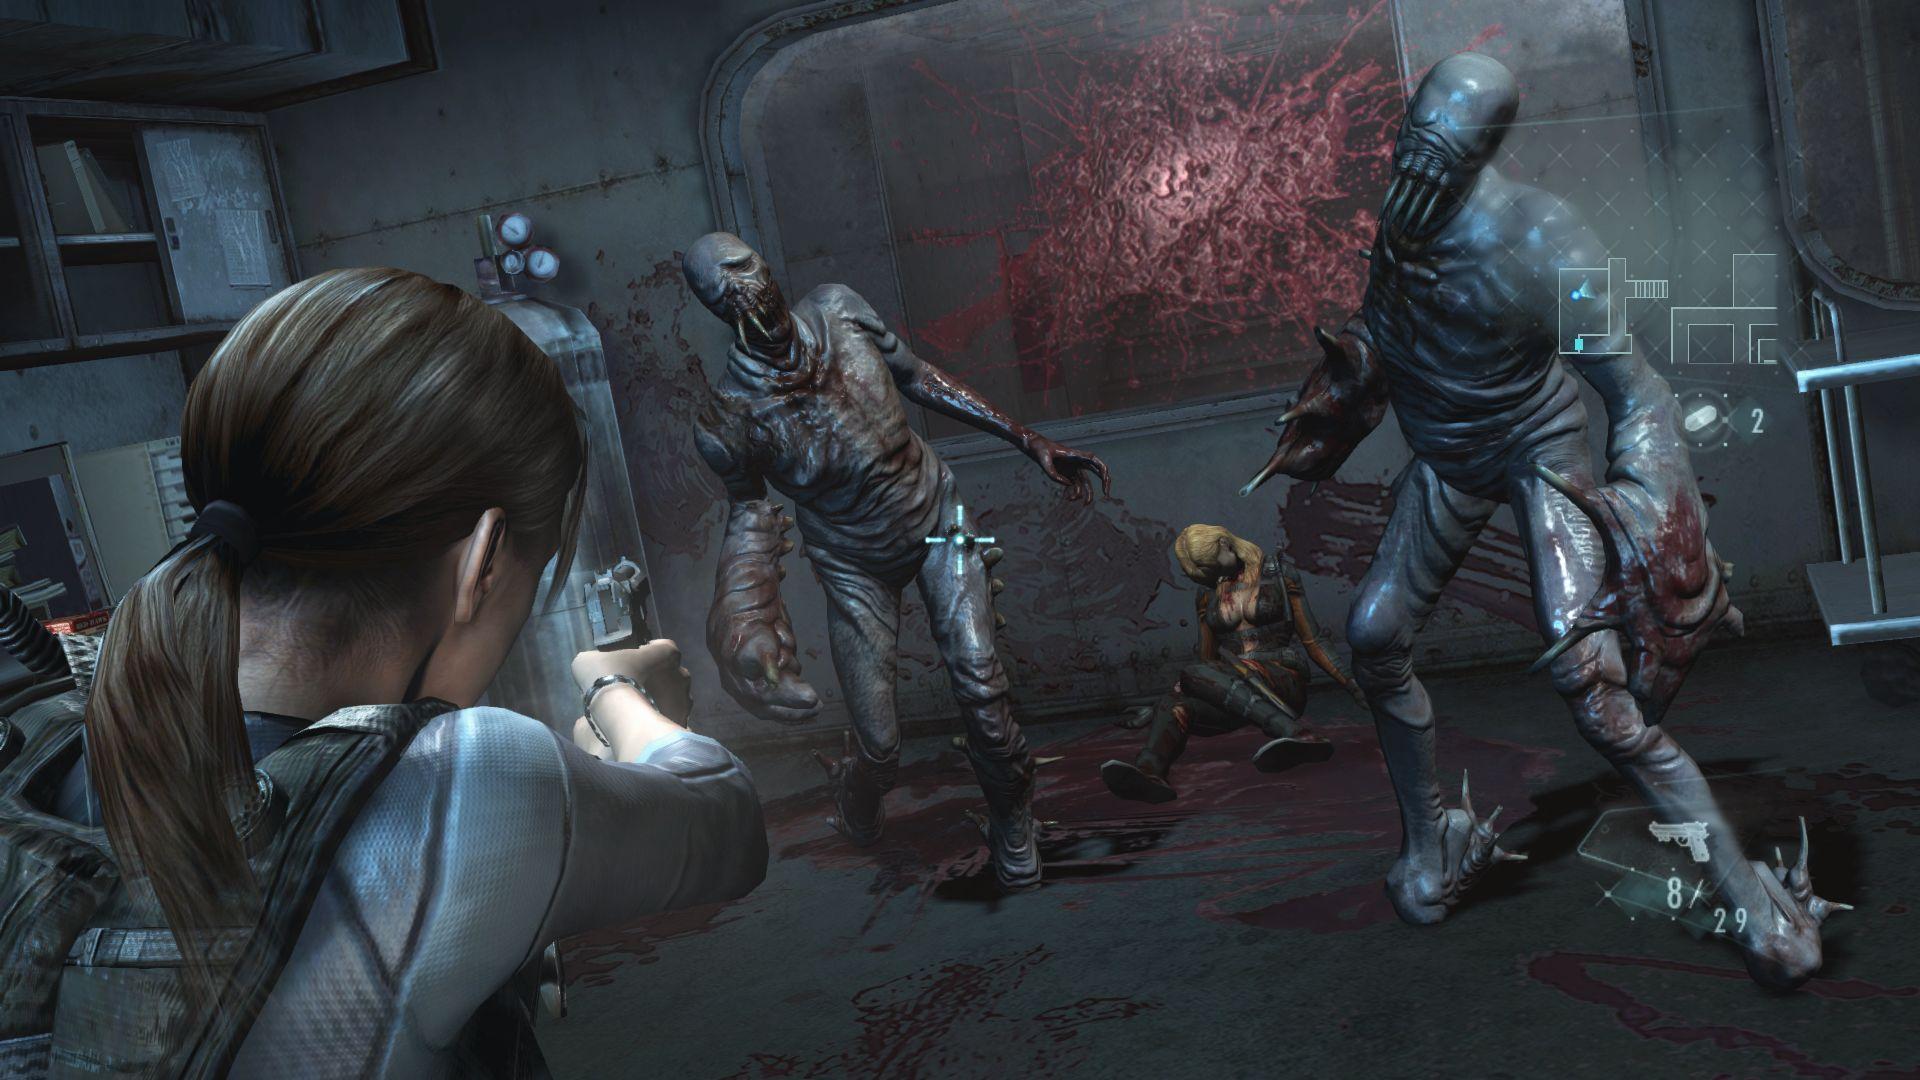 Resident Evil: Revelations saldrá en Xbox One y PS4